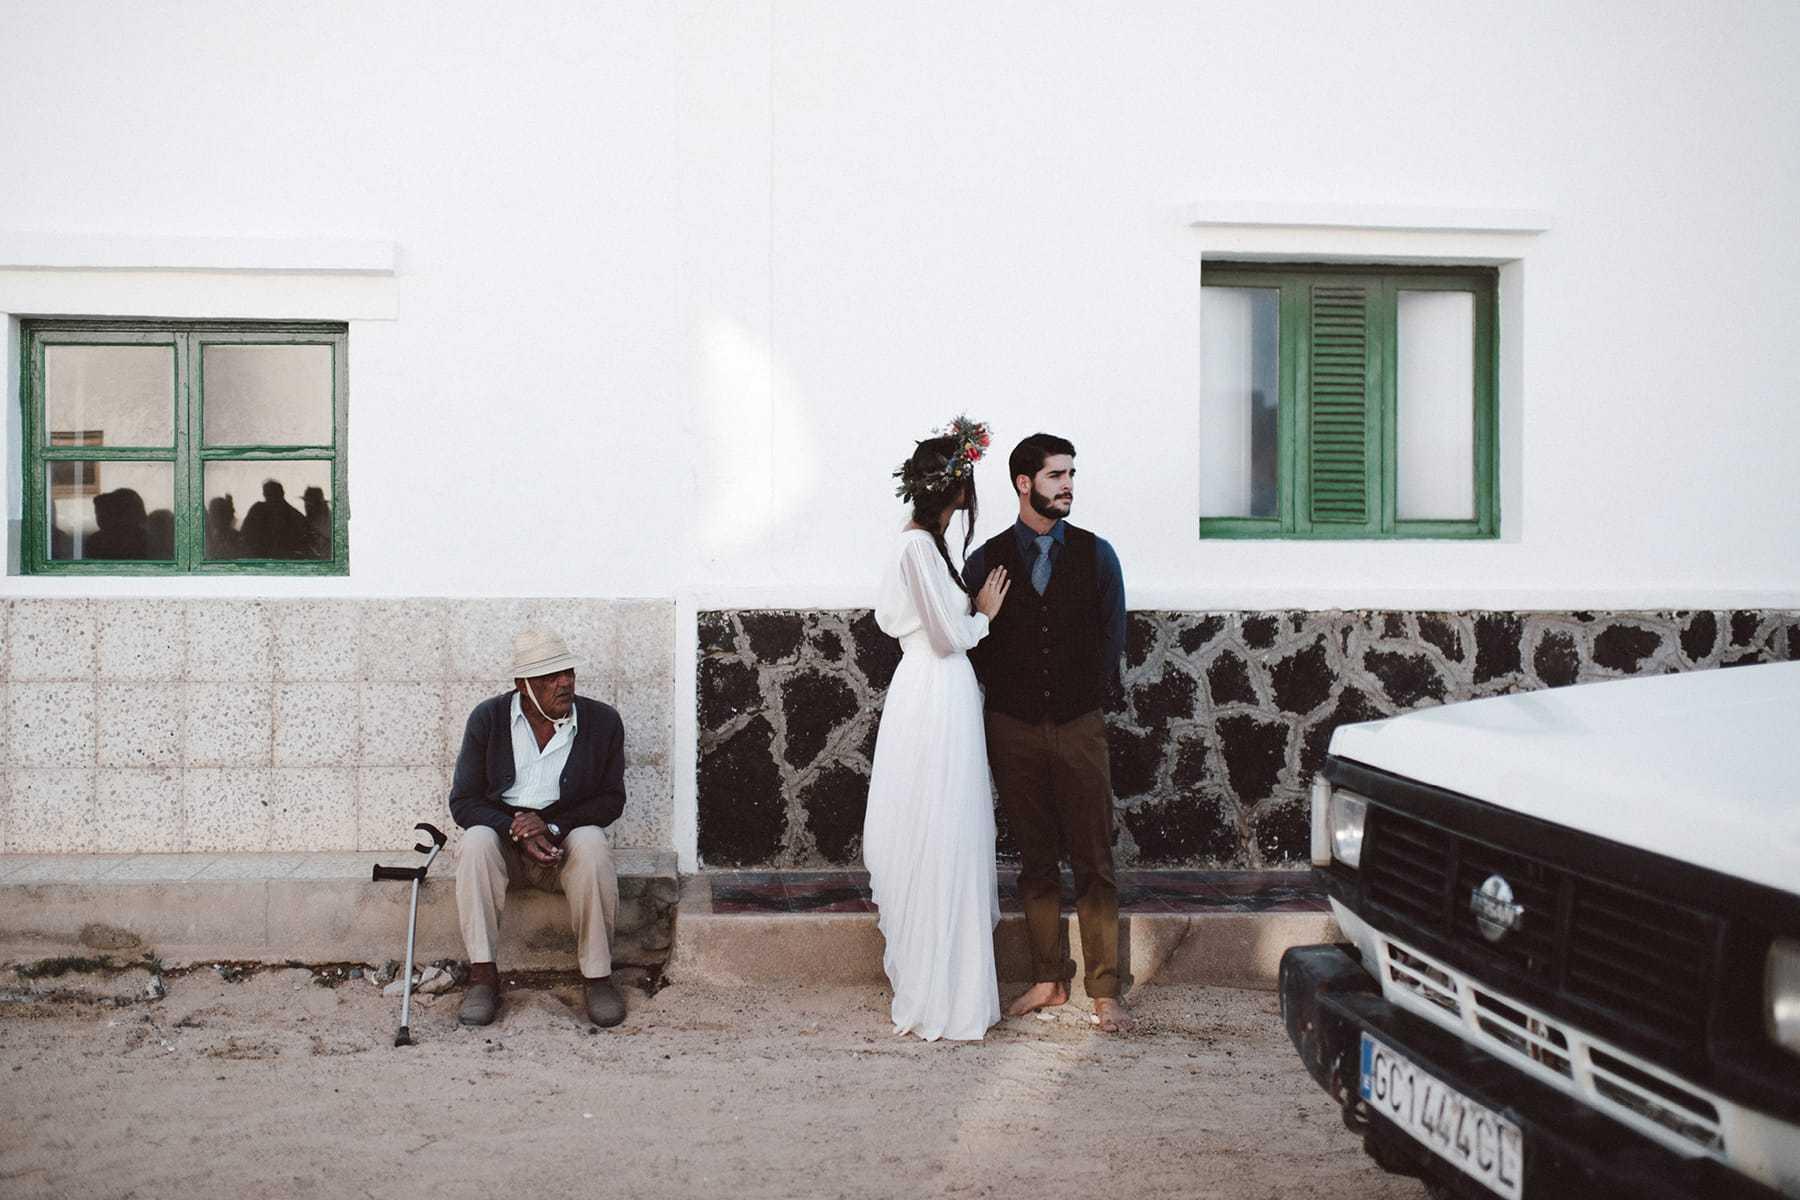 wolves_workshop_hilario_sanchez_fotografo_boda_españa_137